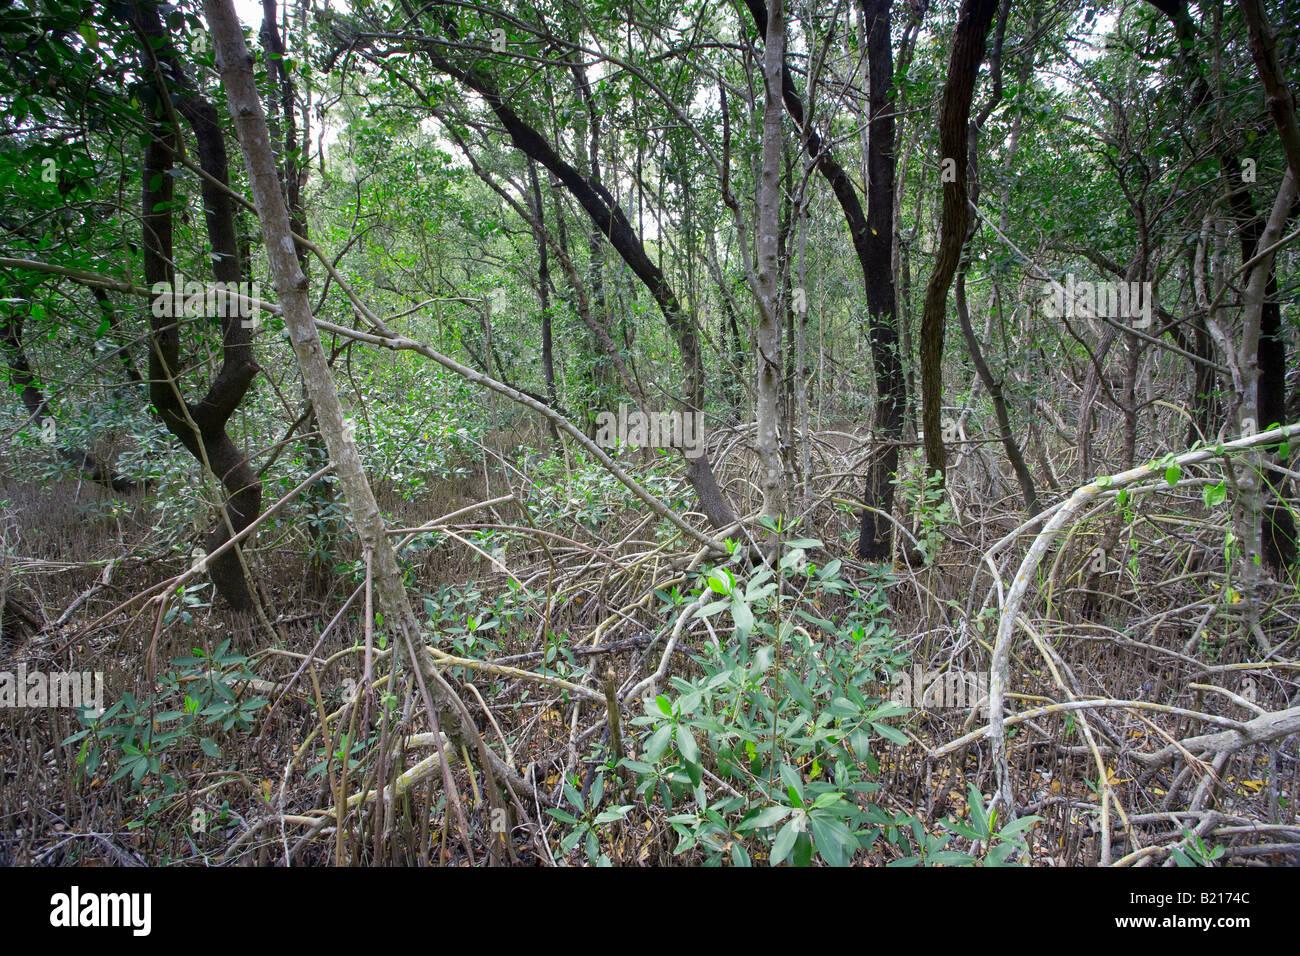 dense forest in Everglades National Park, Florida, USA - Stock Image